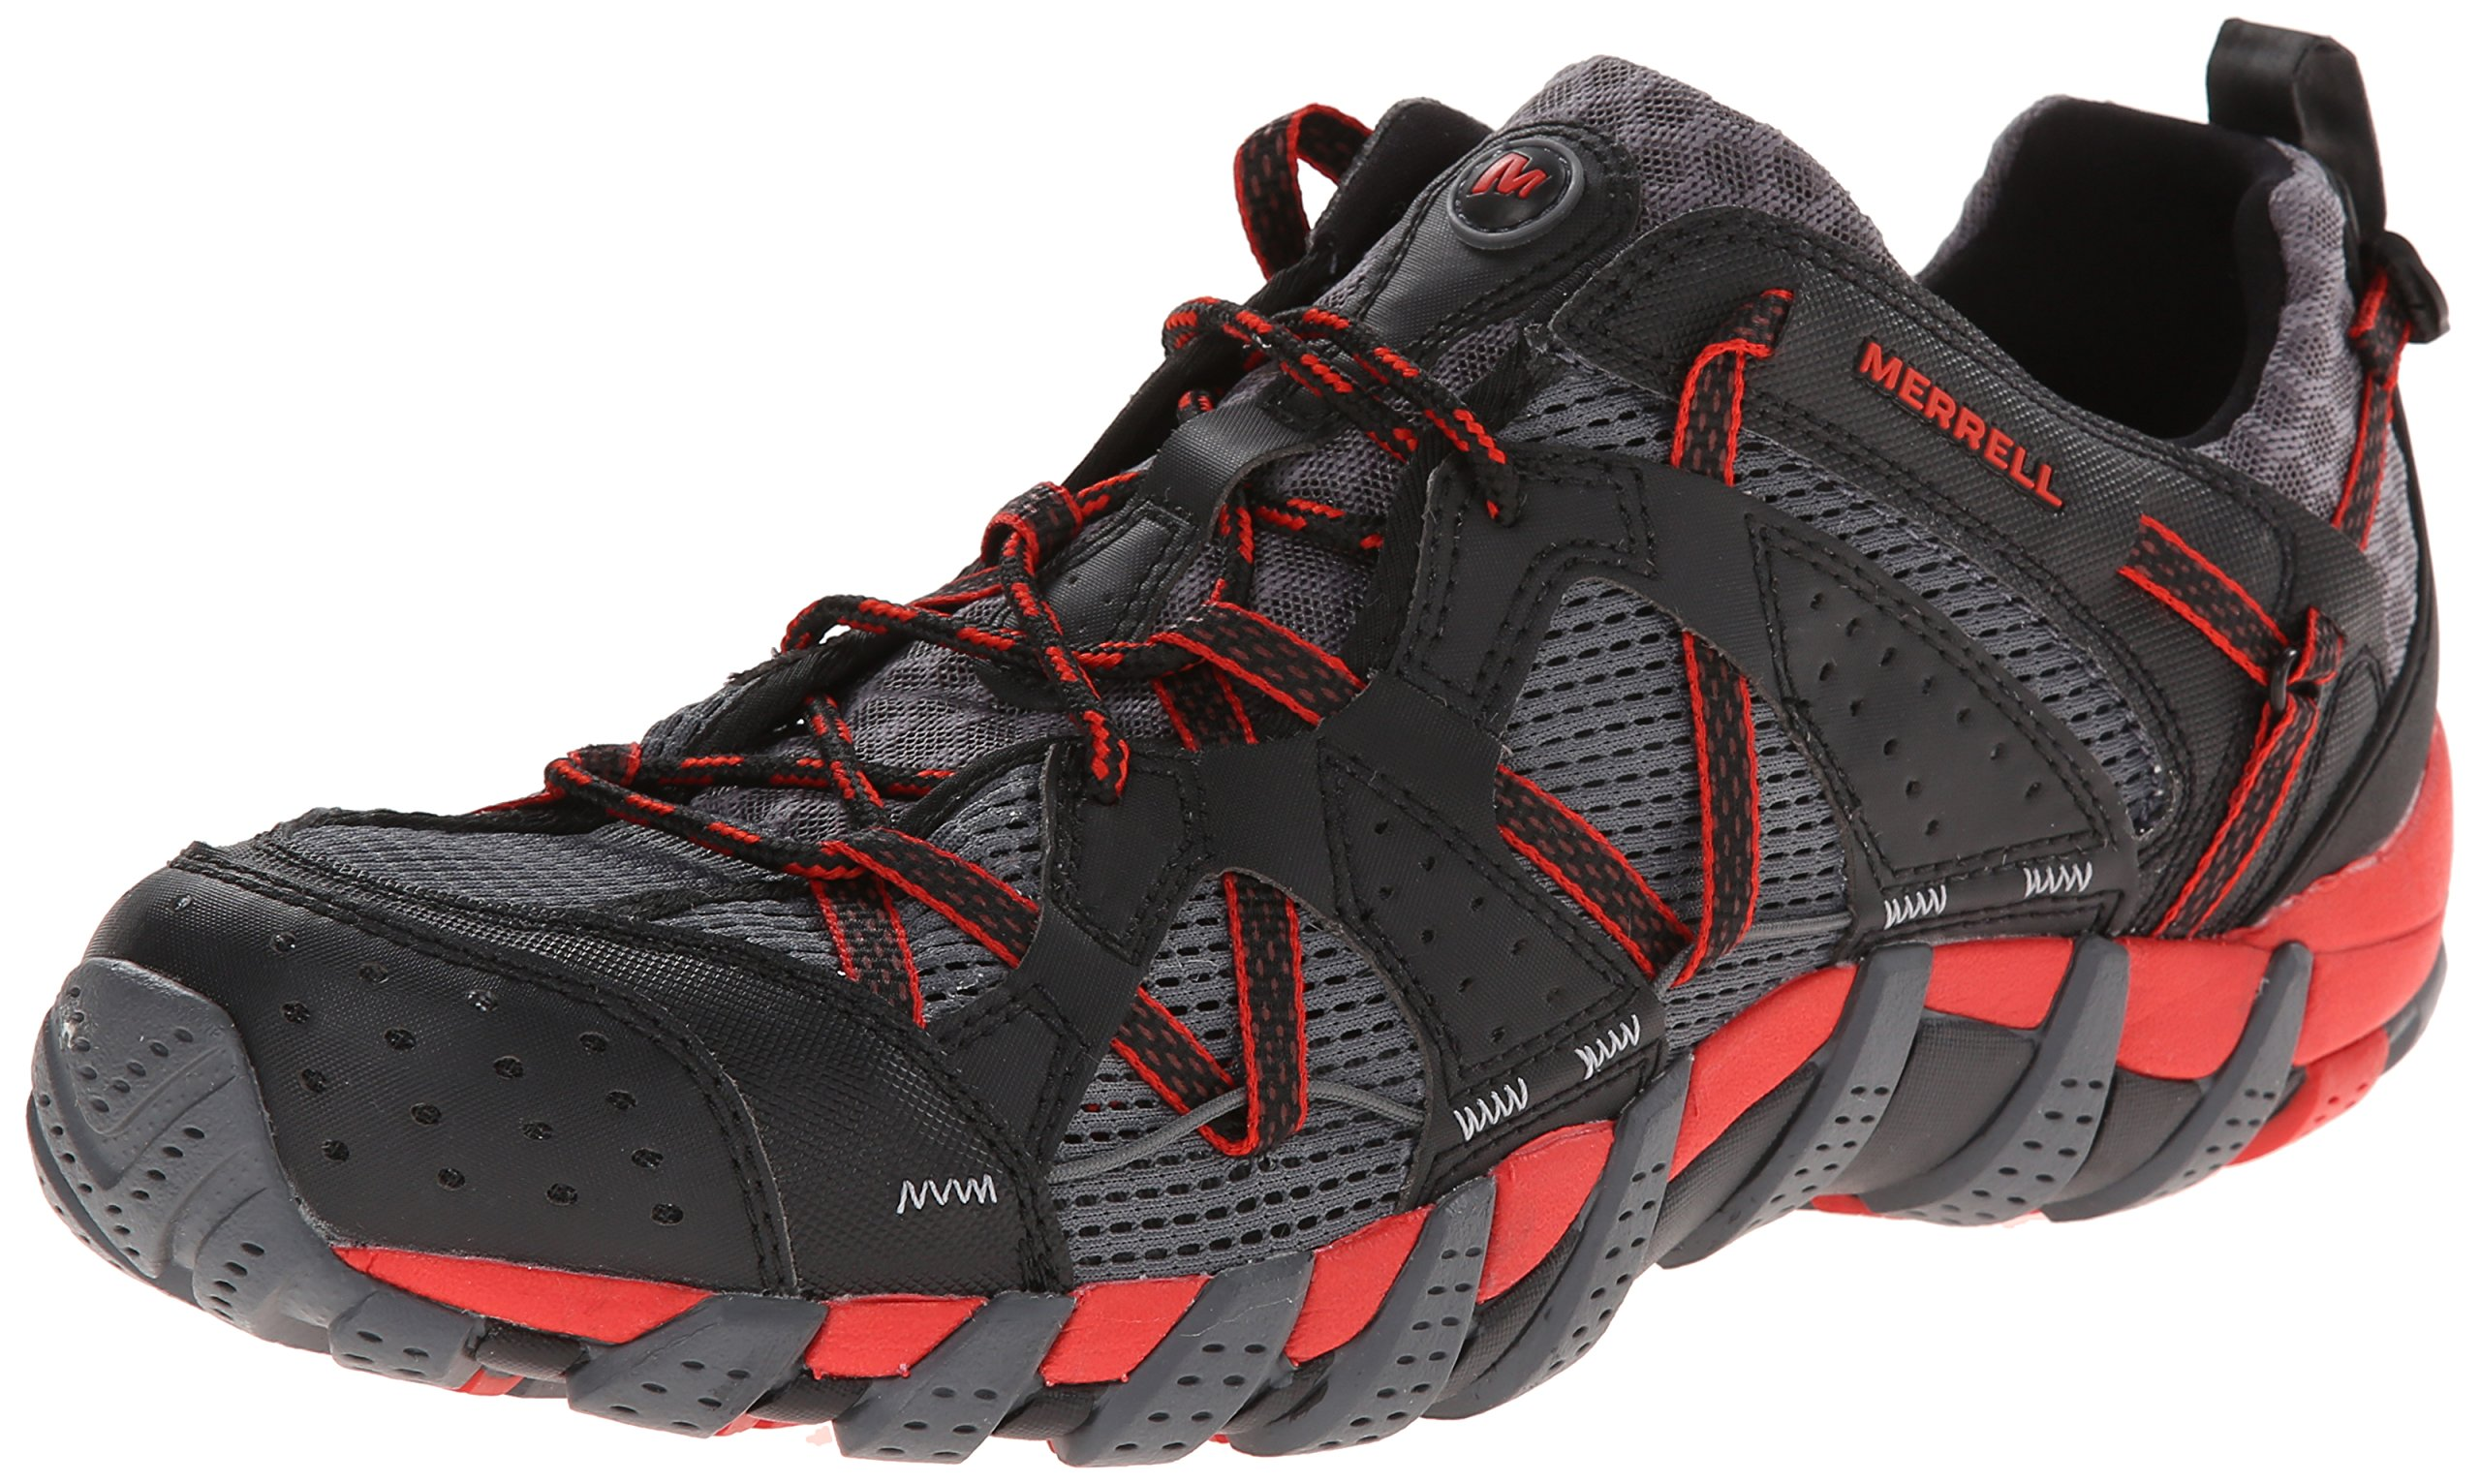 Merrell Men's Waterpro Maipo Water Shoe, Black/Red, 11.5 M US